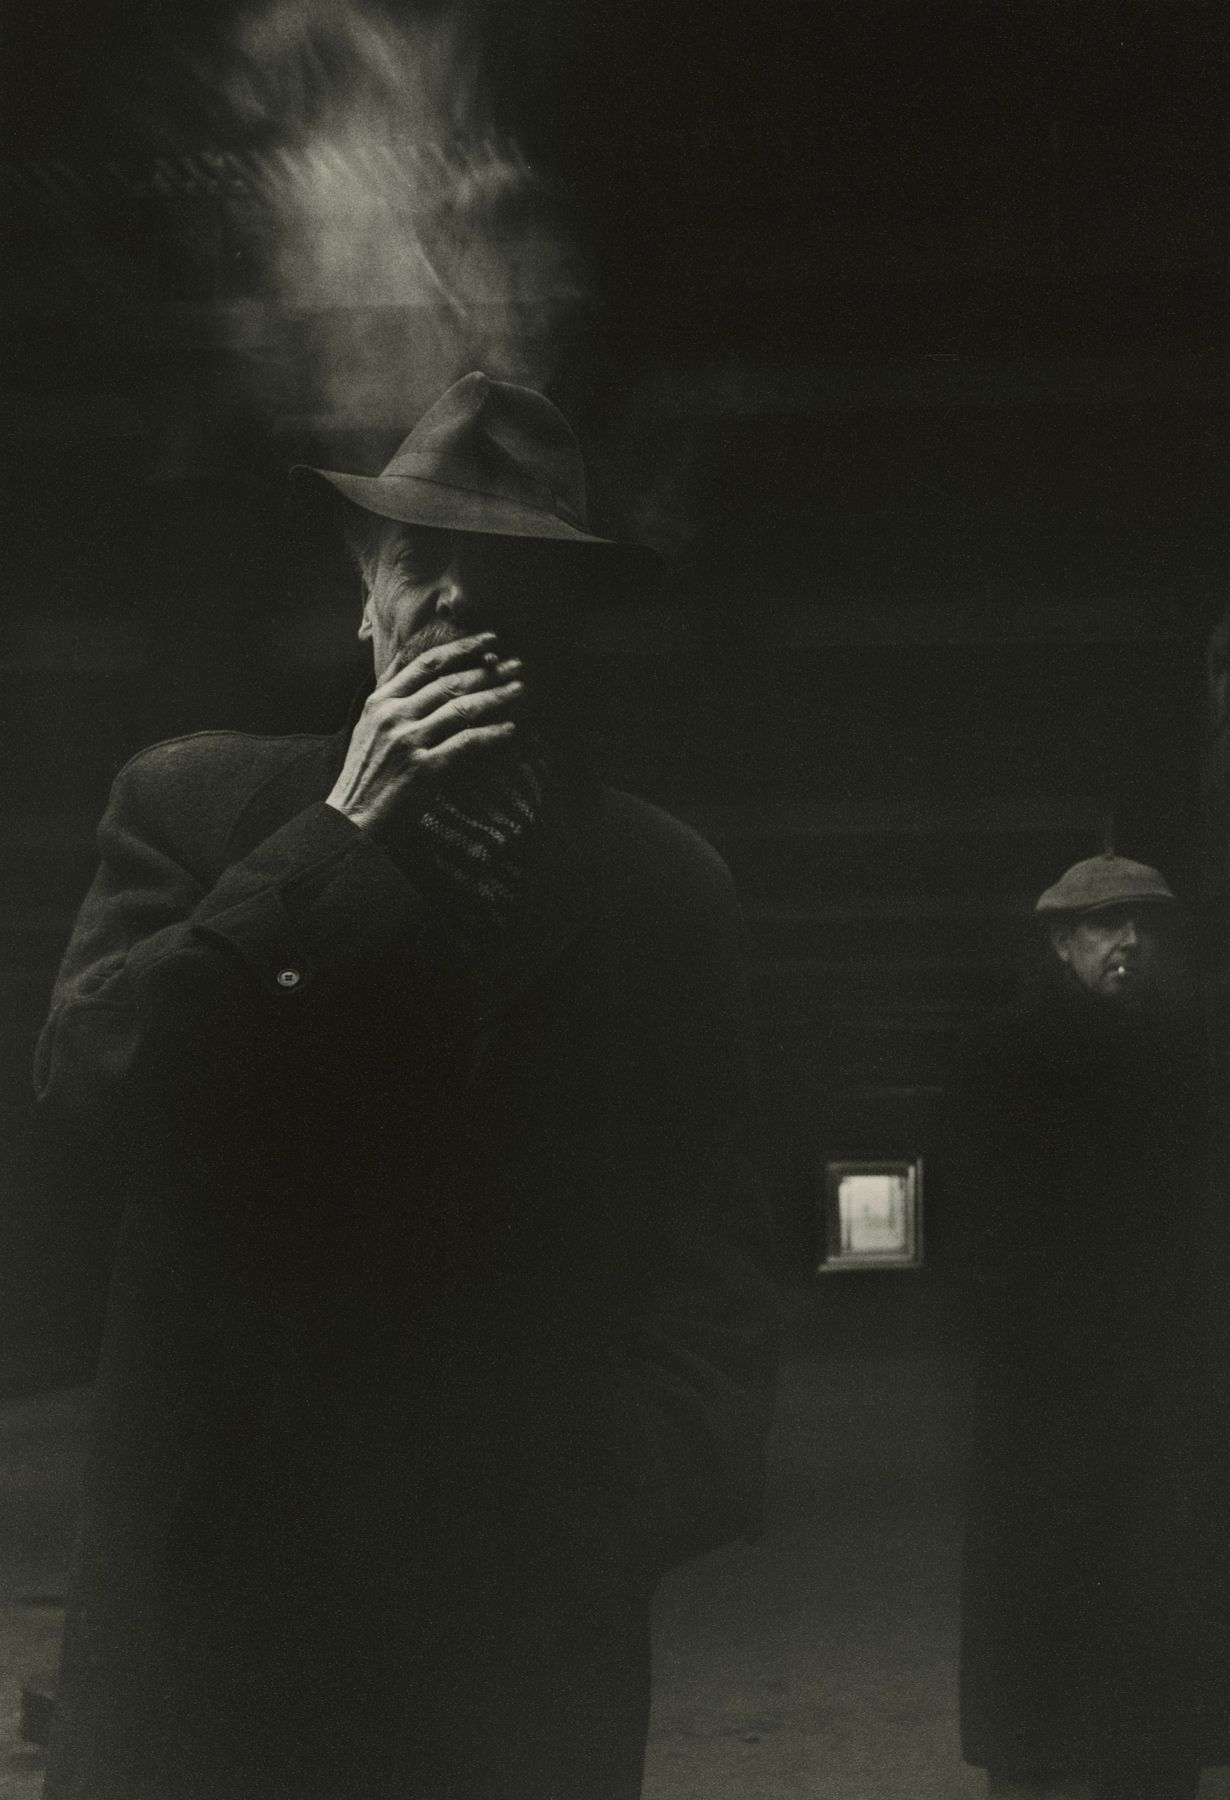 Robert Doisneau - Two Men Smoking - Howard Greenberg Gallery - 2018